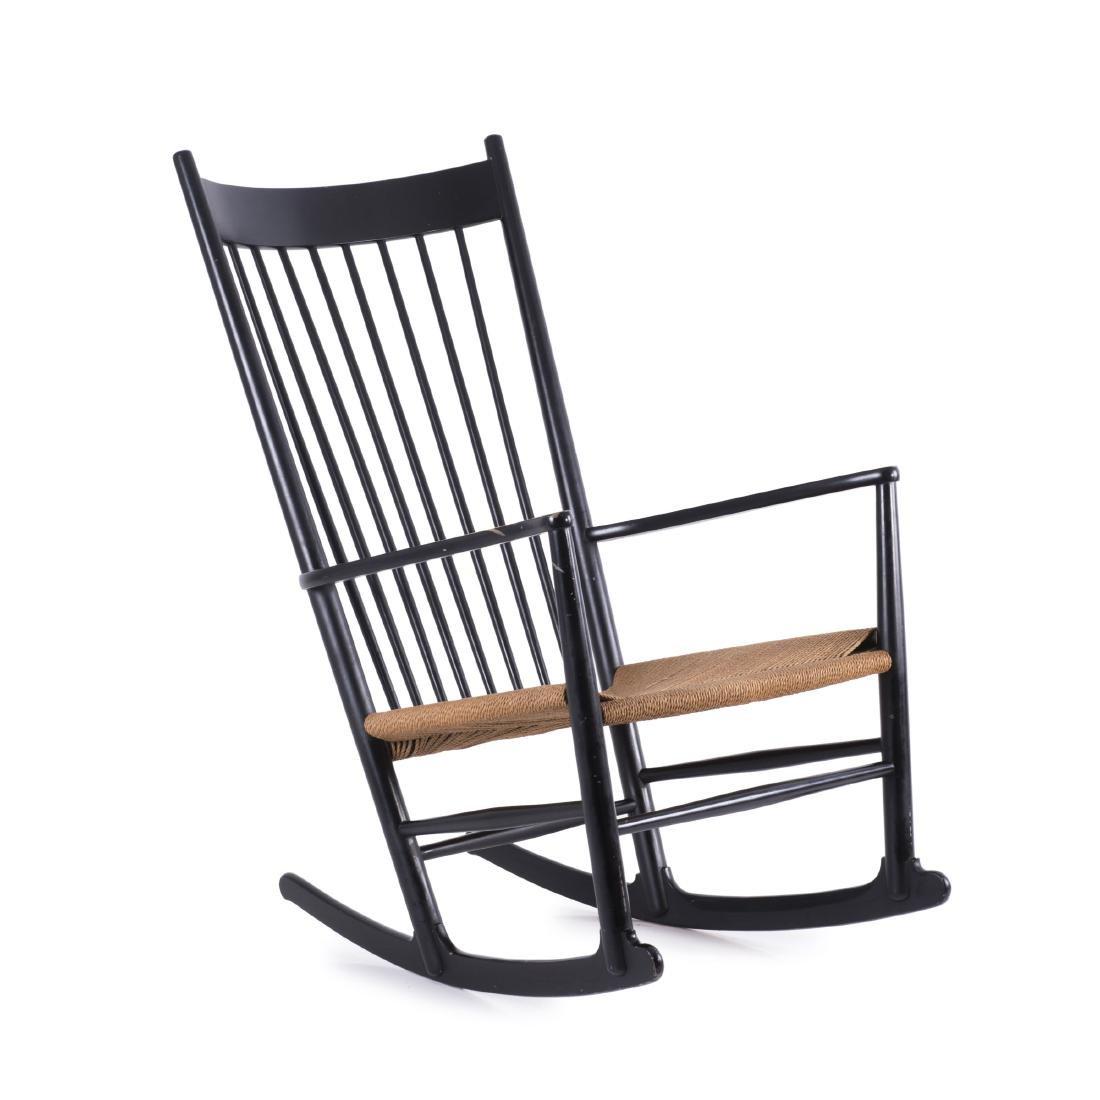 'J 16' rocking chair, 1944